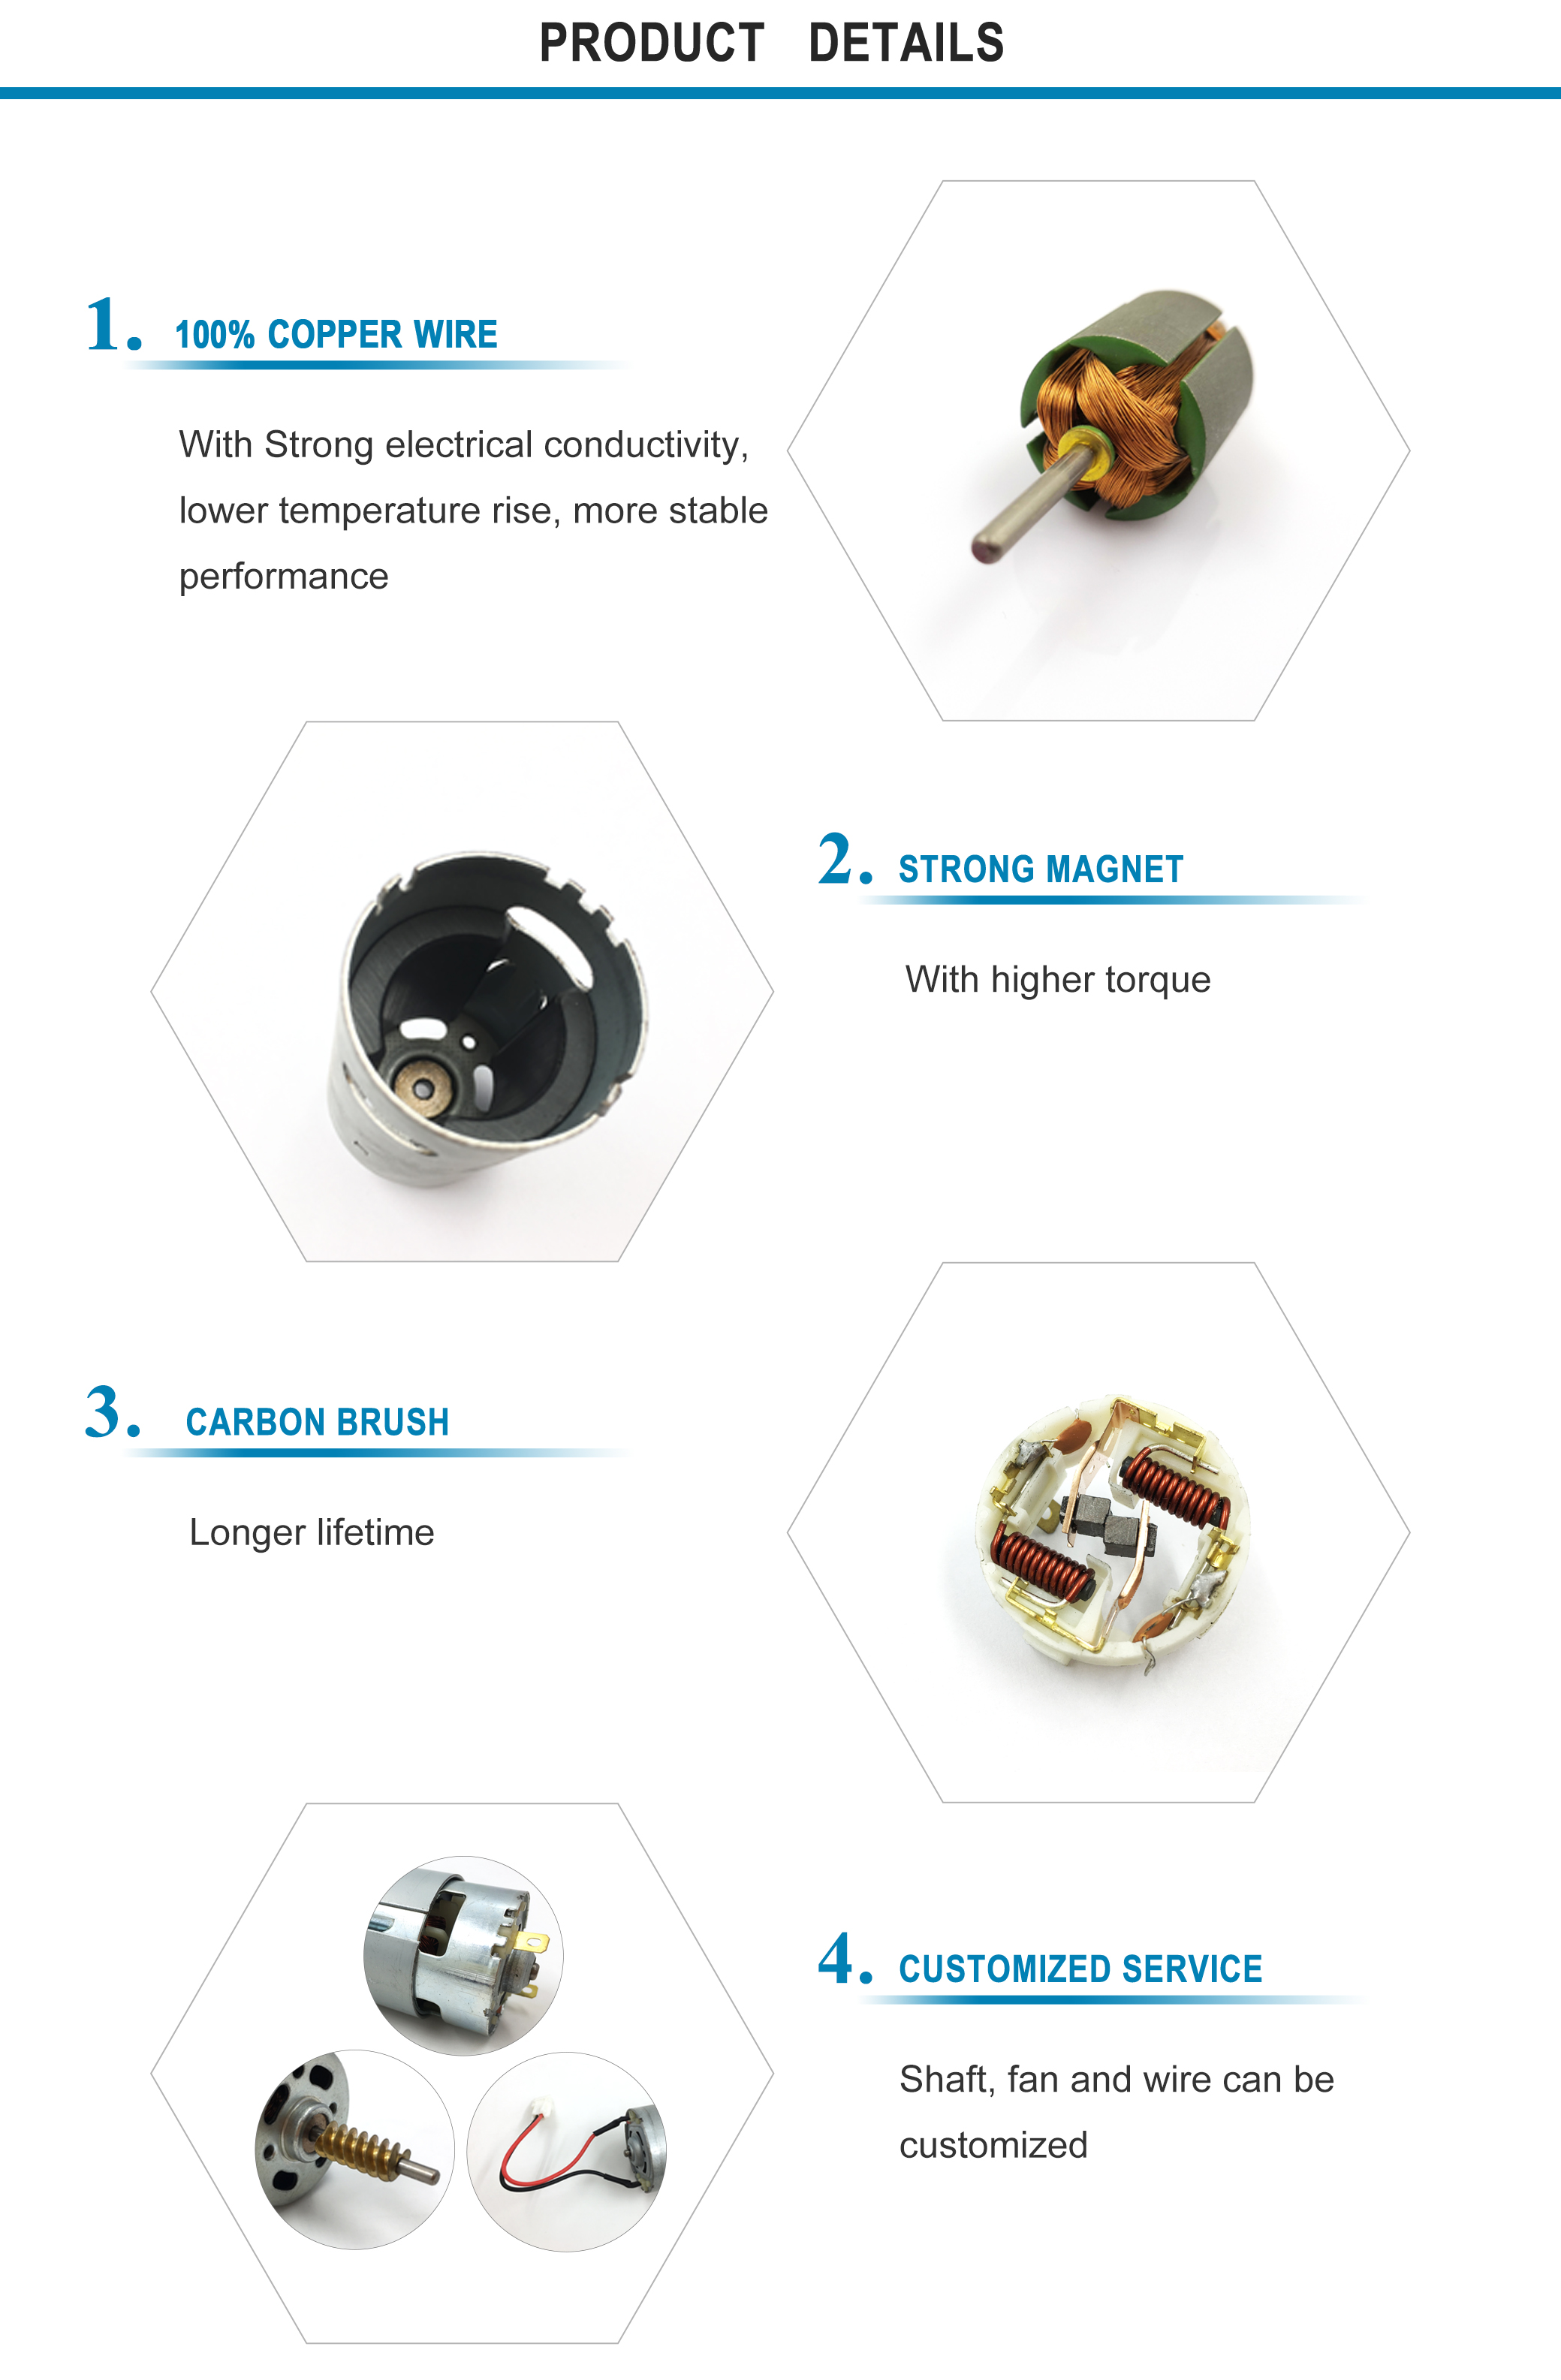 RS-775 high power high torque high speed dc motor, 12v 24v, 200W output, mini dc motor for power tools